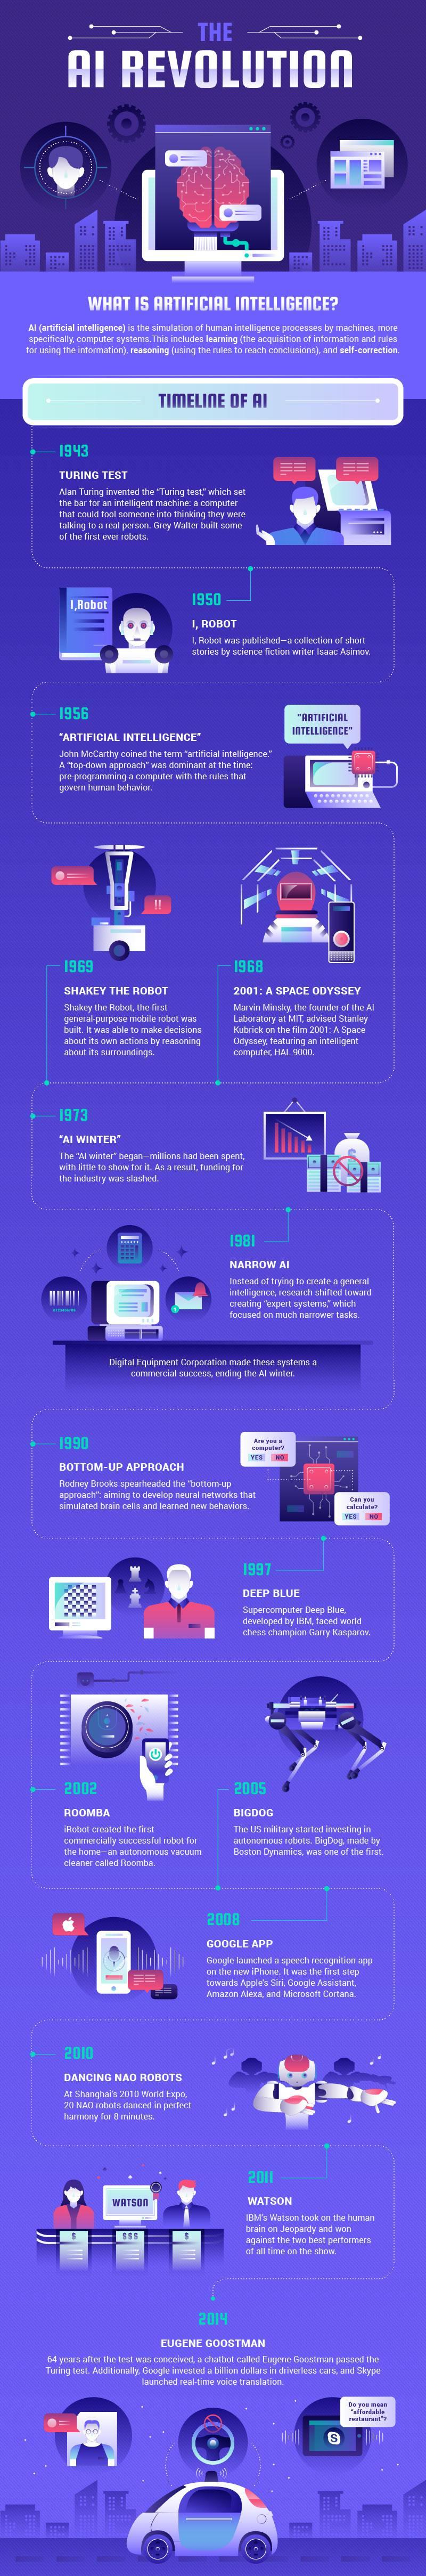 Ai infographic - Part 1